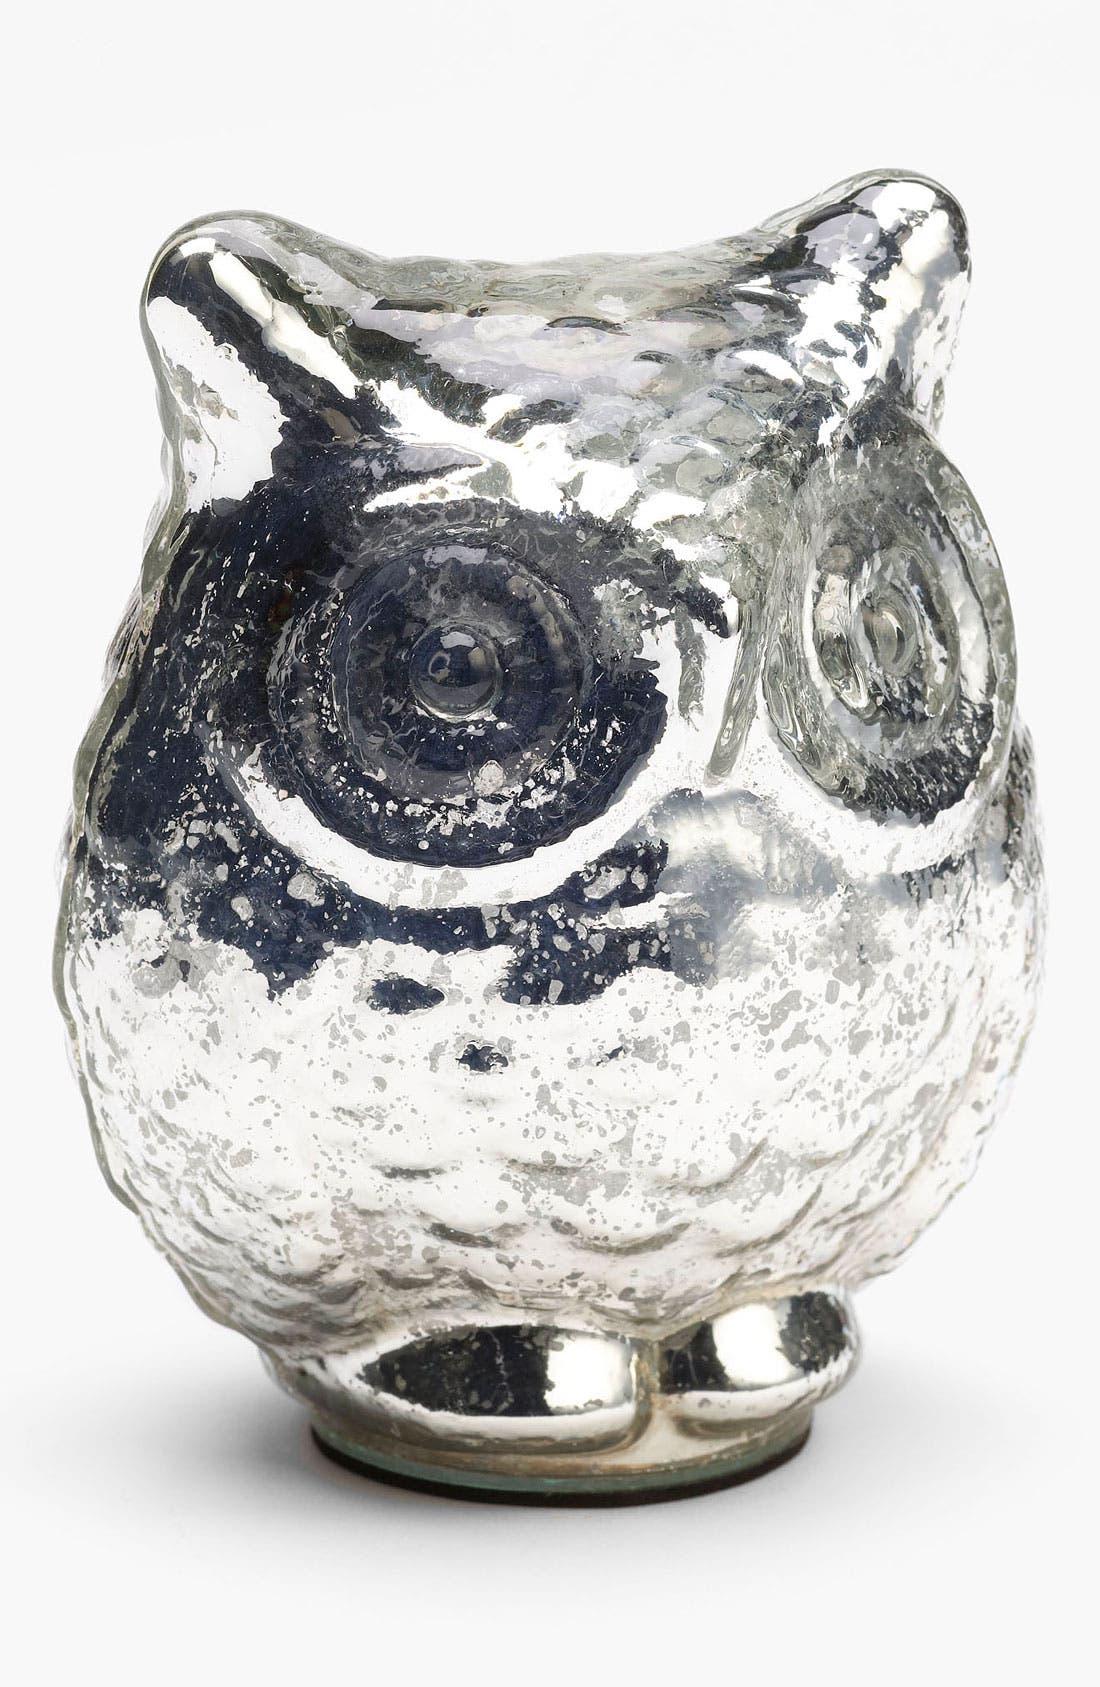 'Large' Mercury Glass Owl Decoration,                             Main thumbnail 1, color,                             040